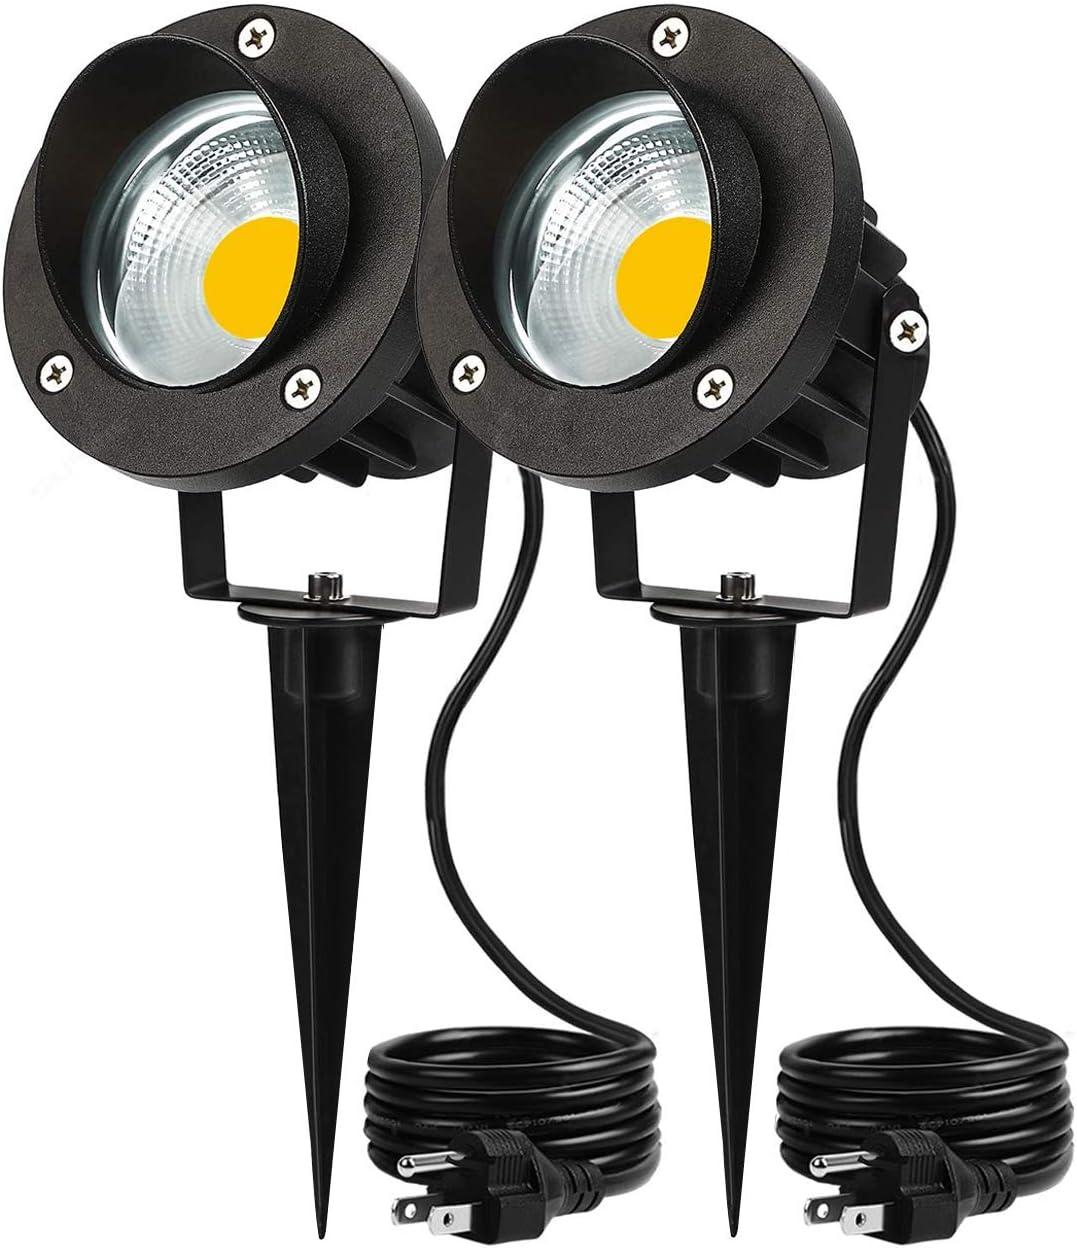 Outdoor LED Landscape Lights Spotlight 5W 120V AC Garden Light IP66 Waterproof for Yard,Trees,Flag,Lawn,Patio Outside Flood Lights 2 Pack